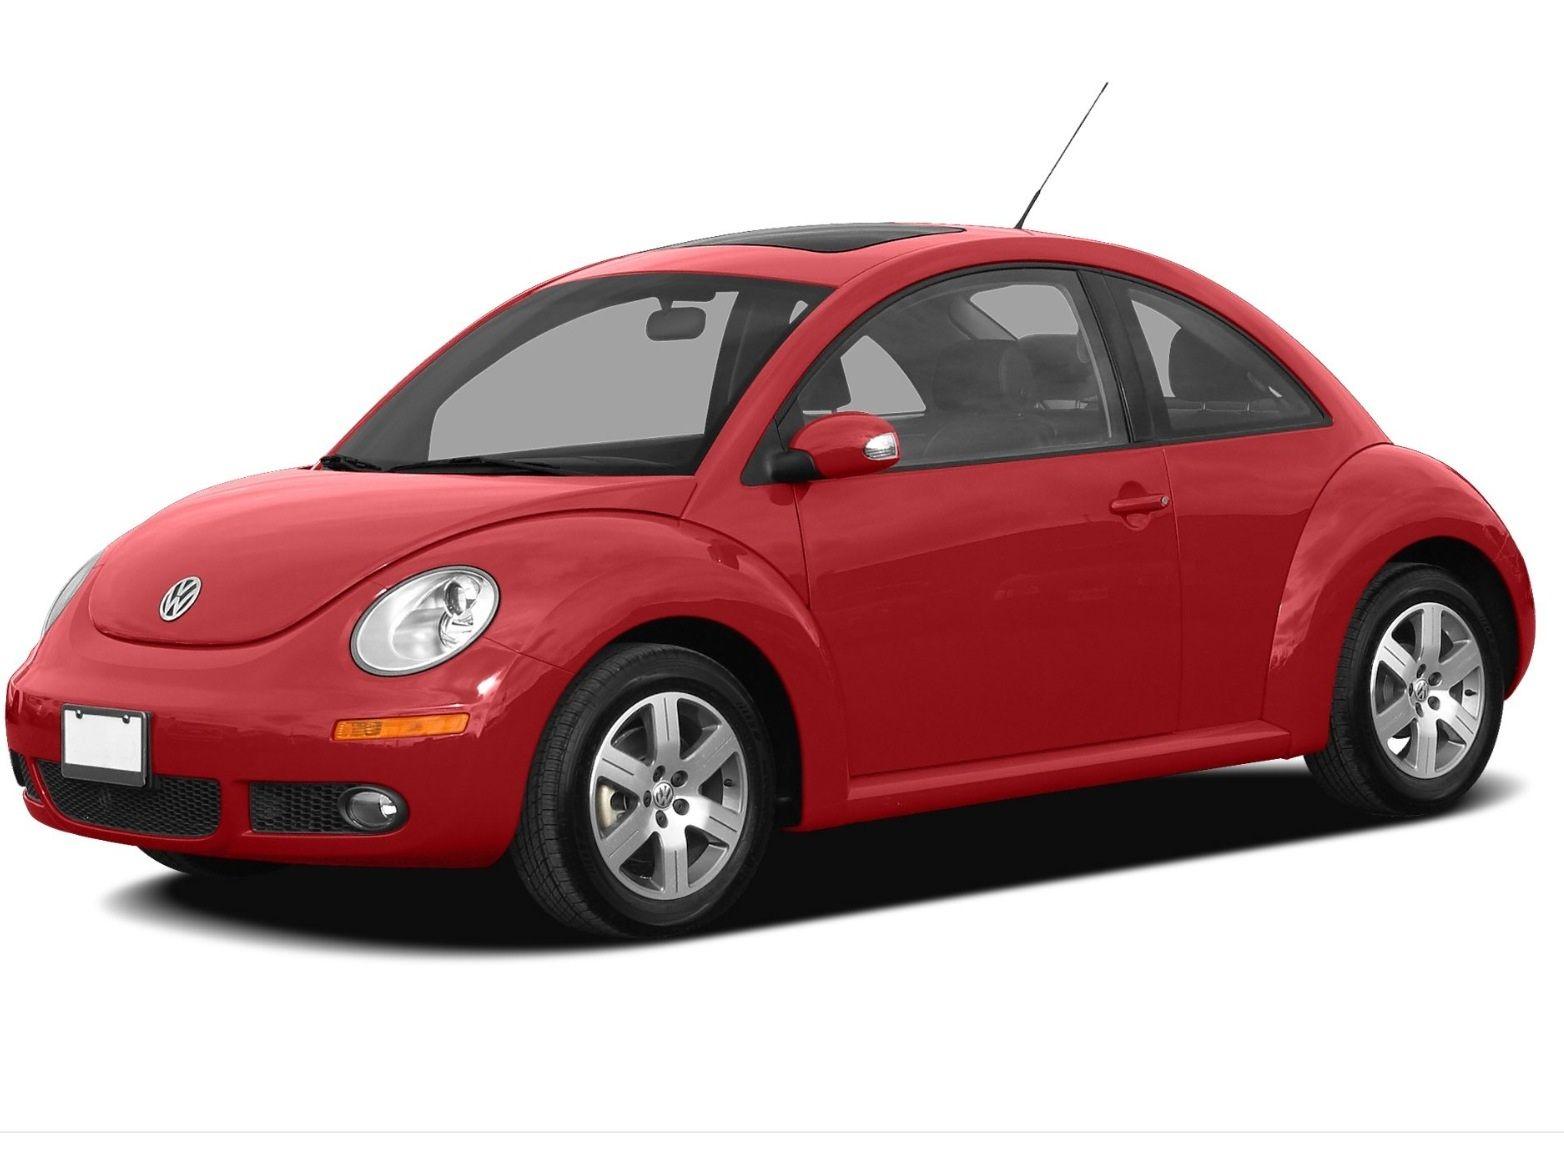 Vw Beetle Parts, Vw Beetle Convertible, Volkswagen Models, Volkswagen New  Beetle, Volkswagen